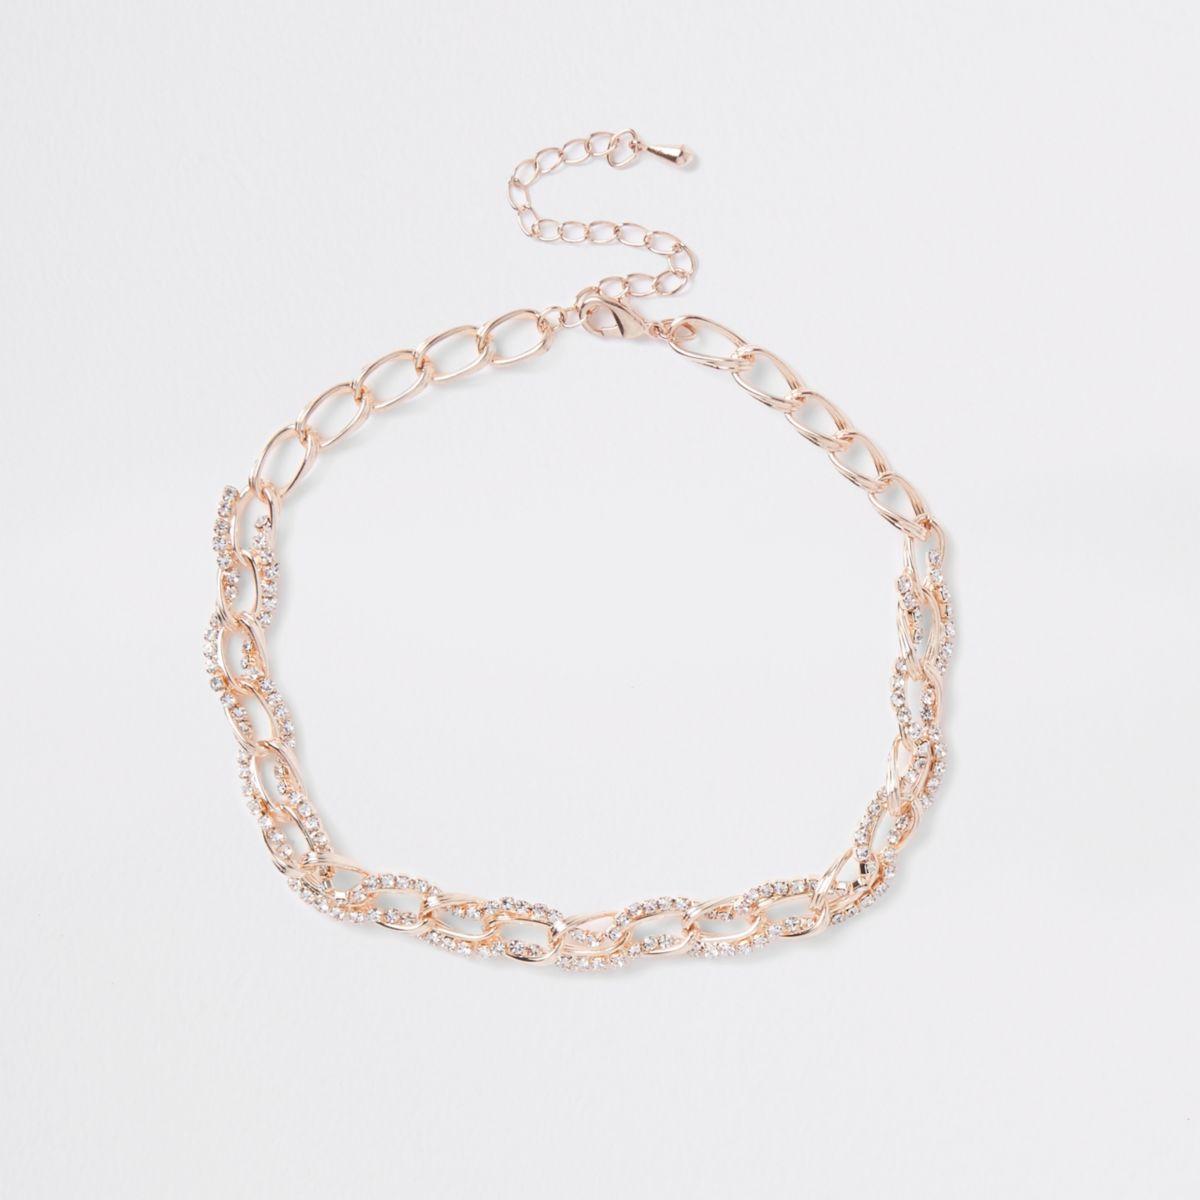 Rose gold rhinestone chain link choker